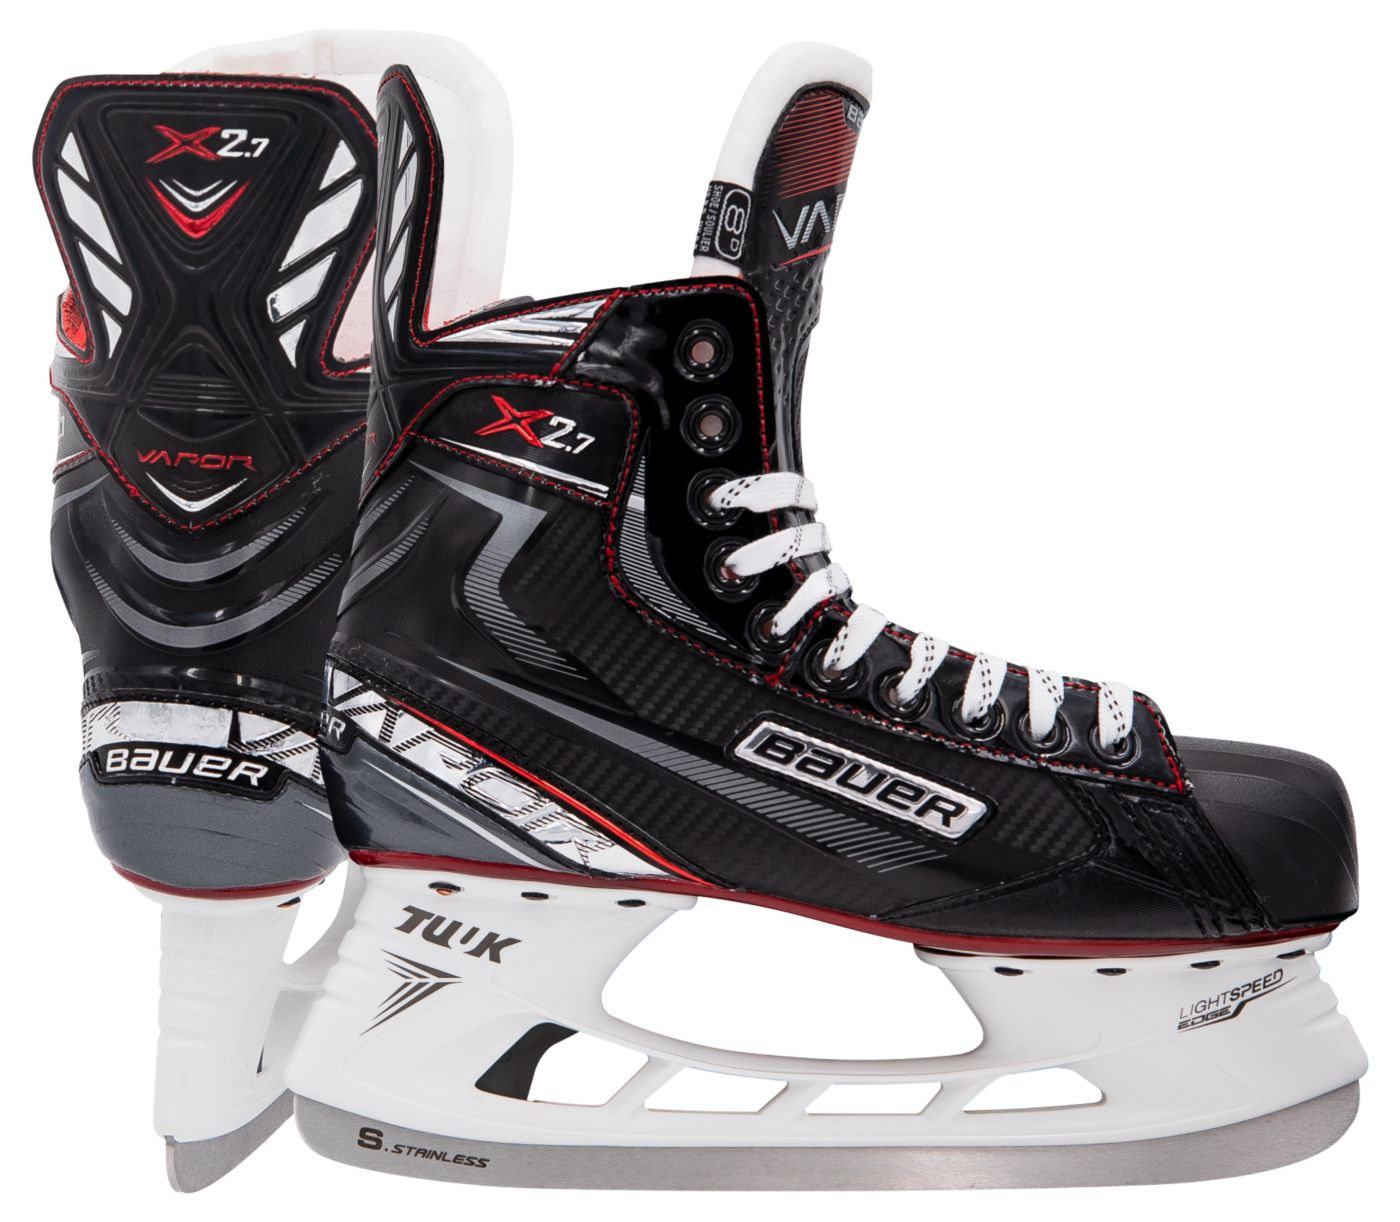 Bauer Junior Vapor X2.7 Ice Hockey Skate